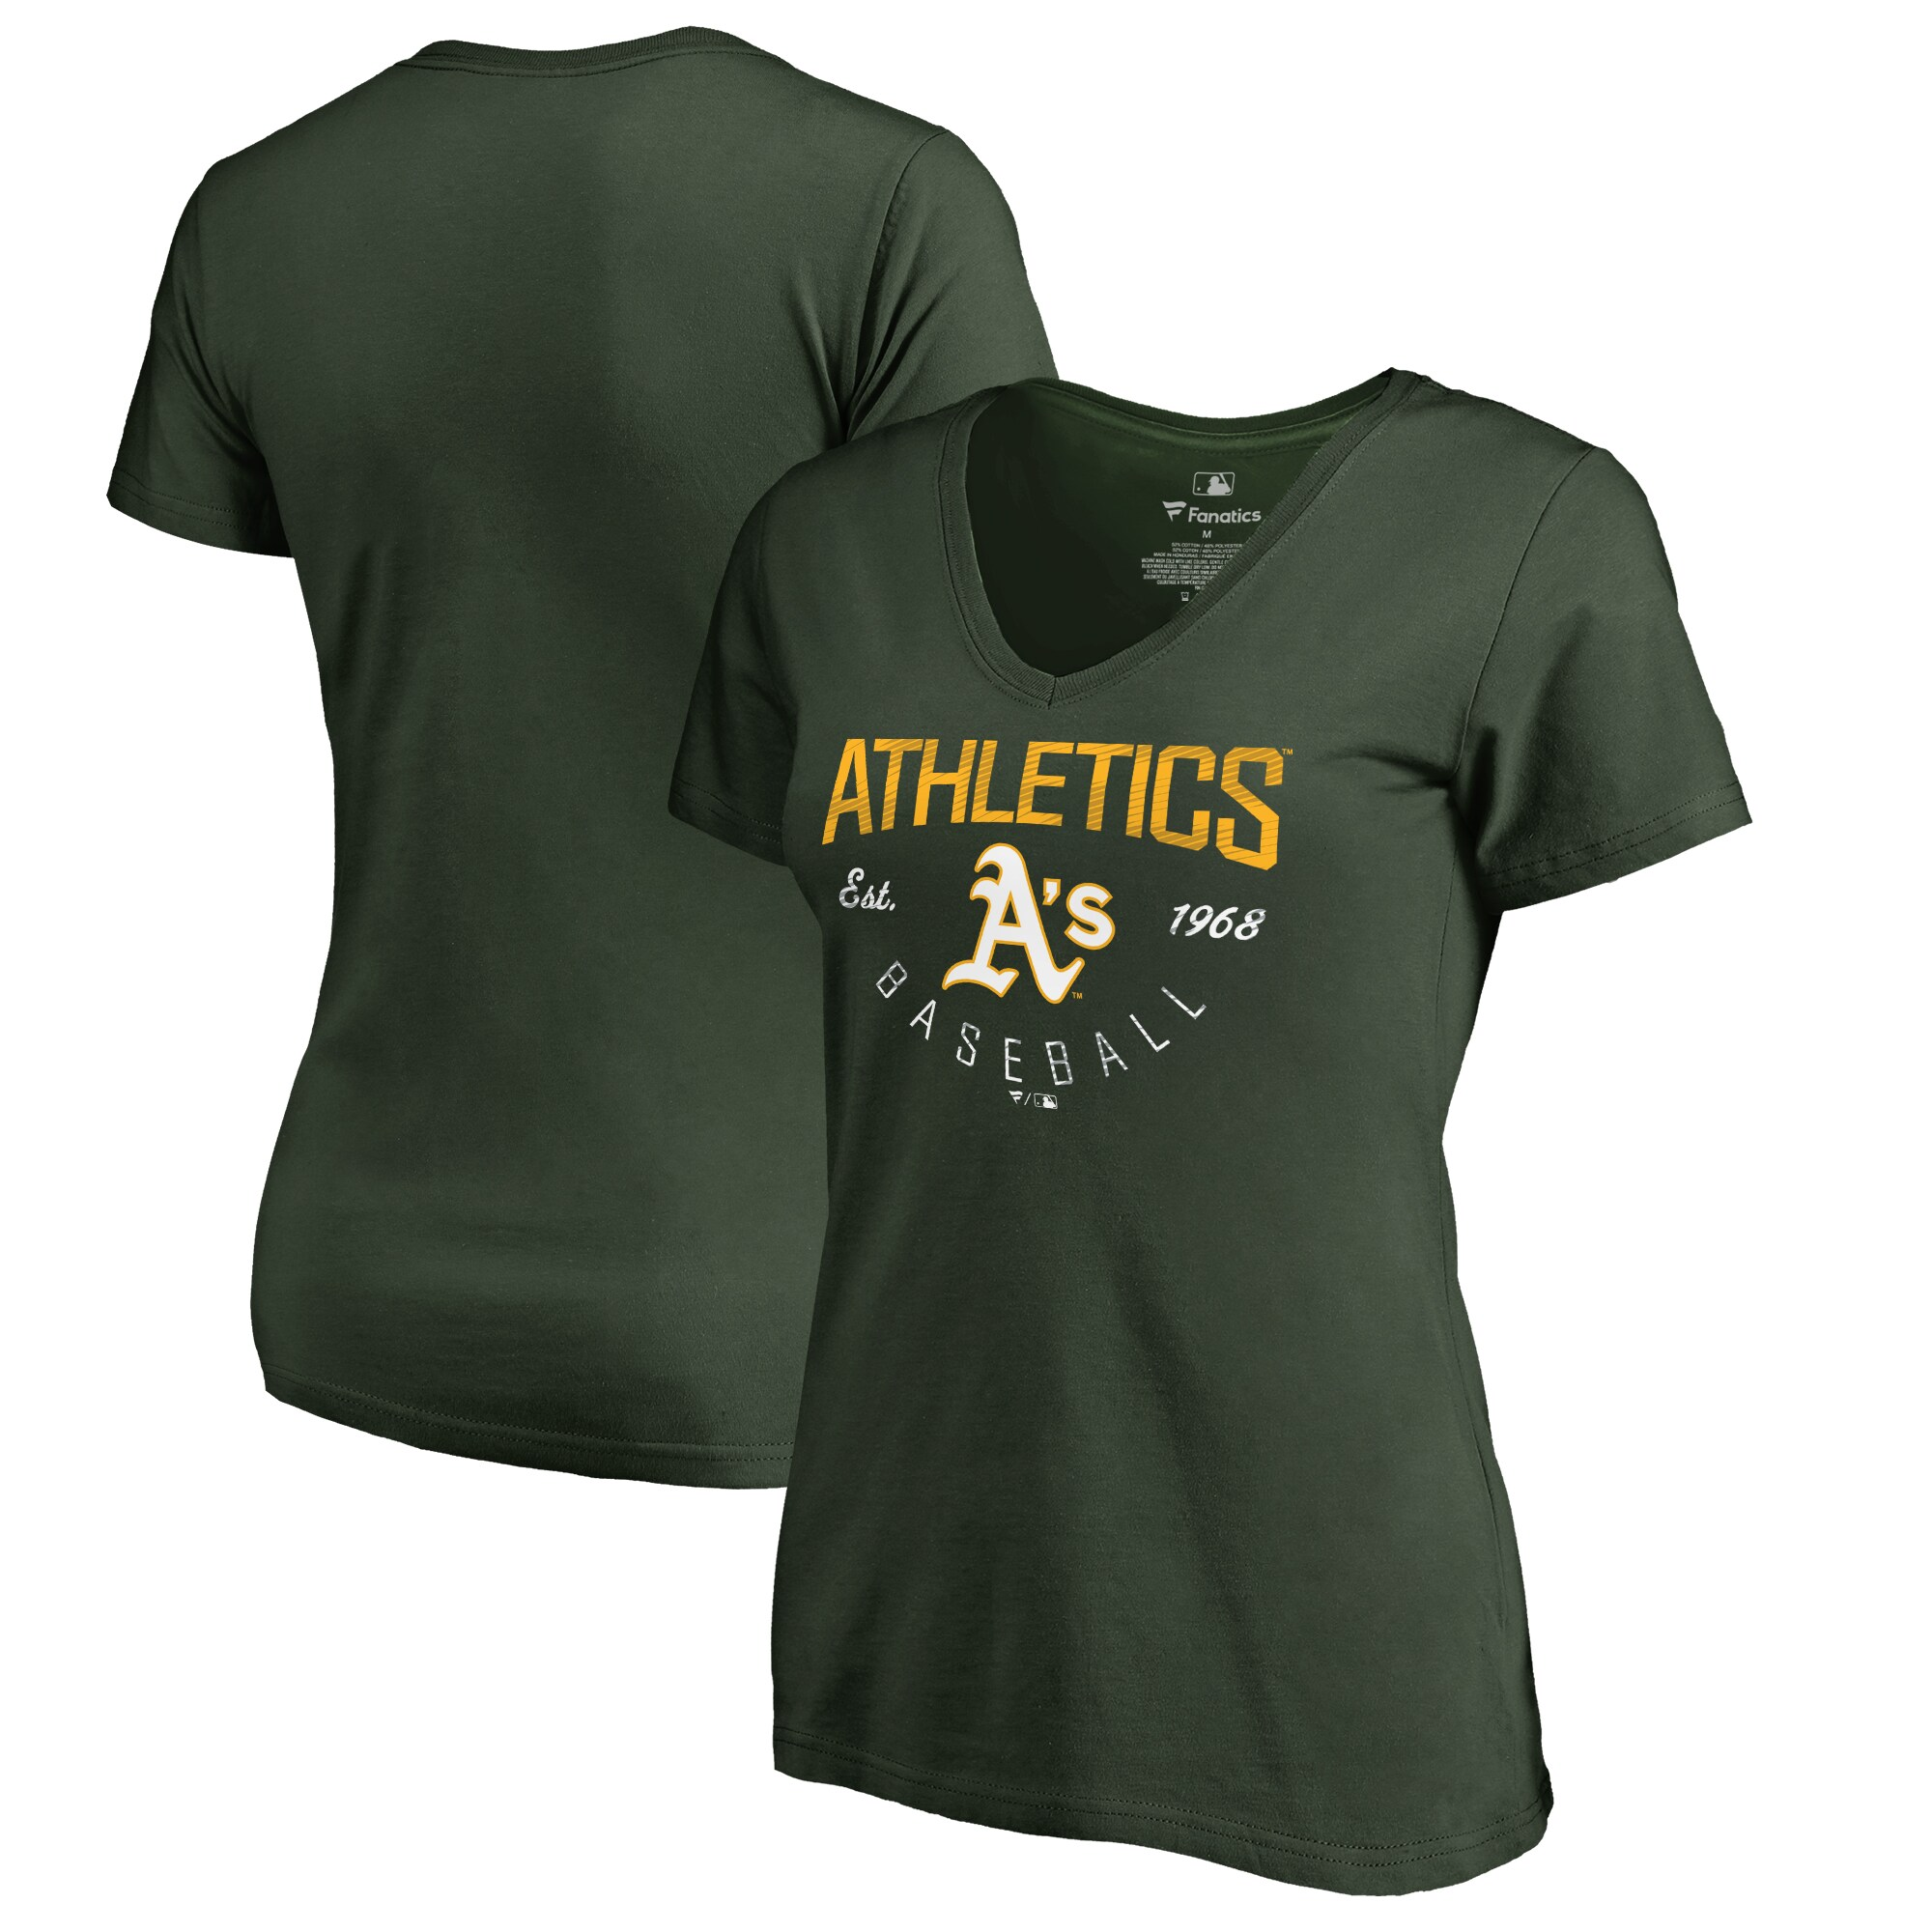 Oakland Athletics Fanatics Branded Women's Plus Sizes Live For It T-Shirt - Green